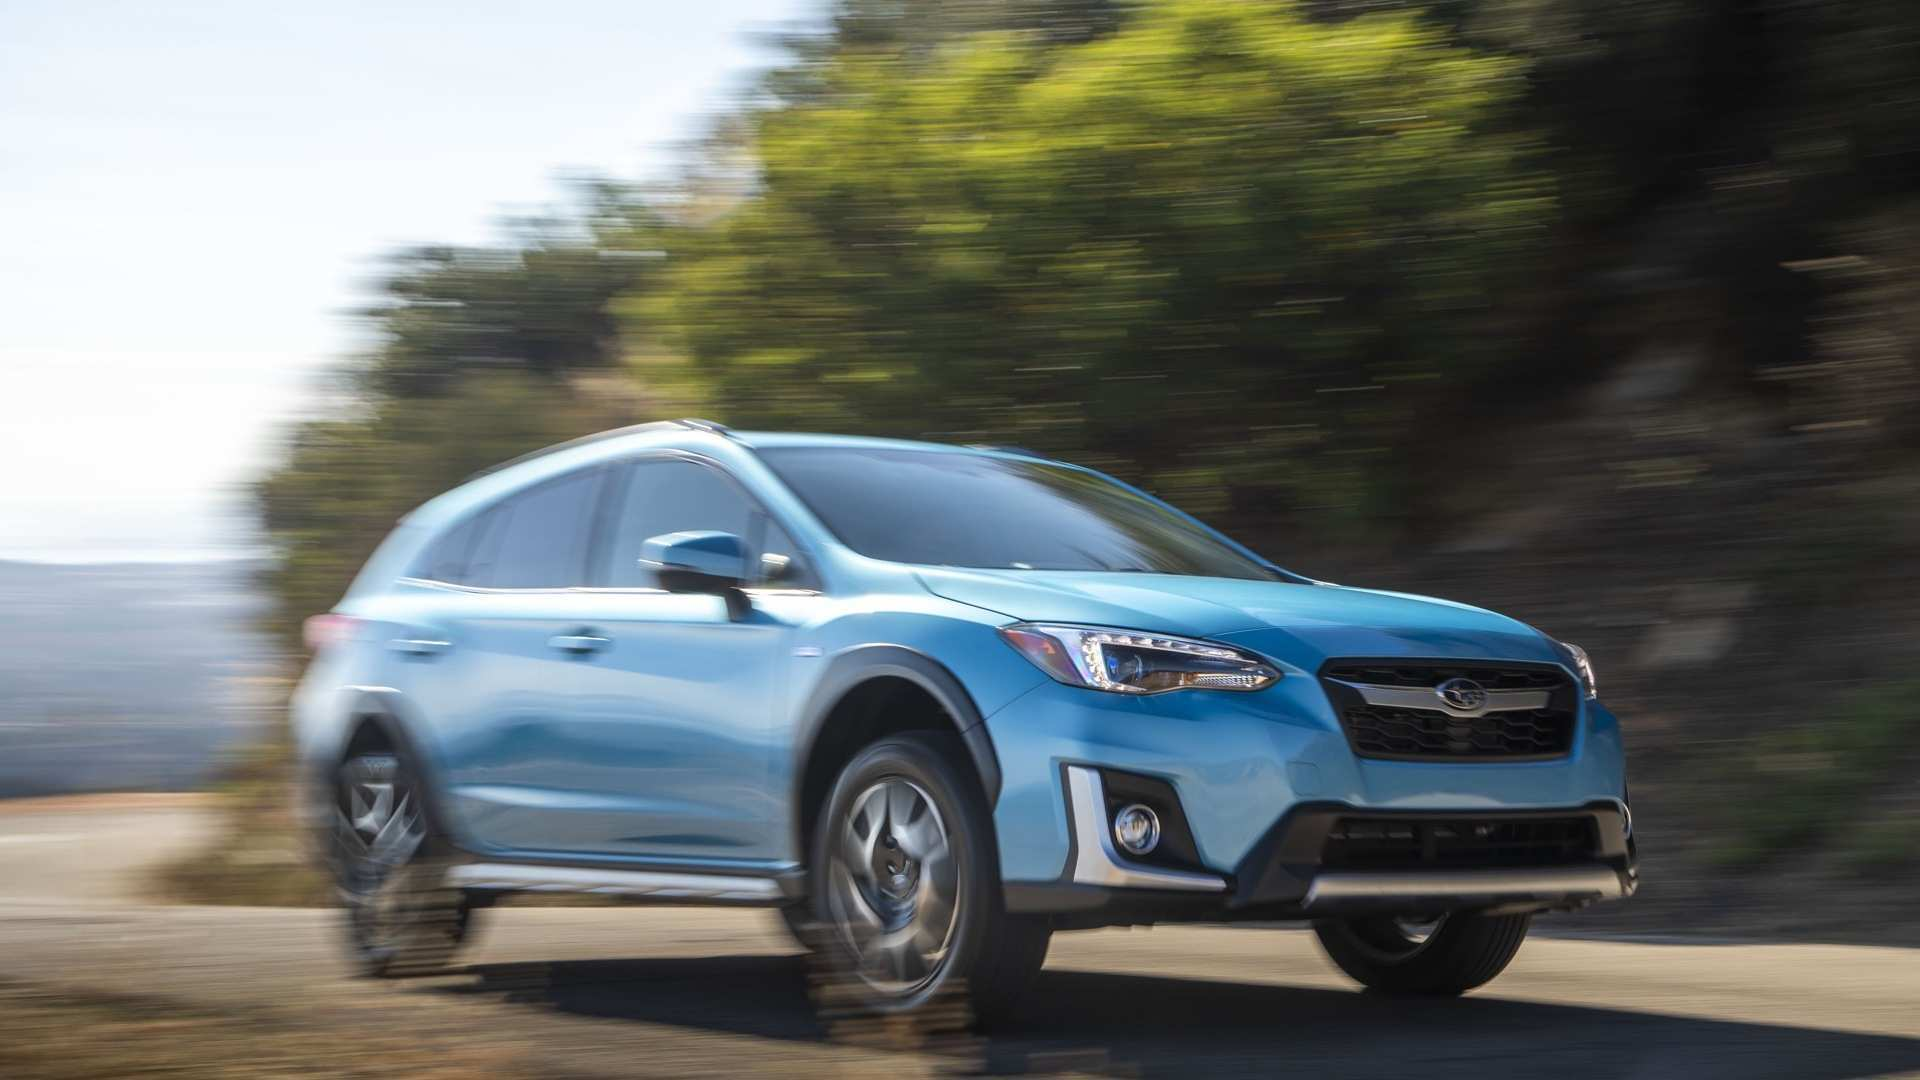 34 Concept of Subaru Impreza Hybrid 2020 Performance by Subaru Impreza Hybrid 2020